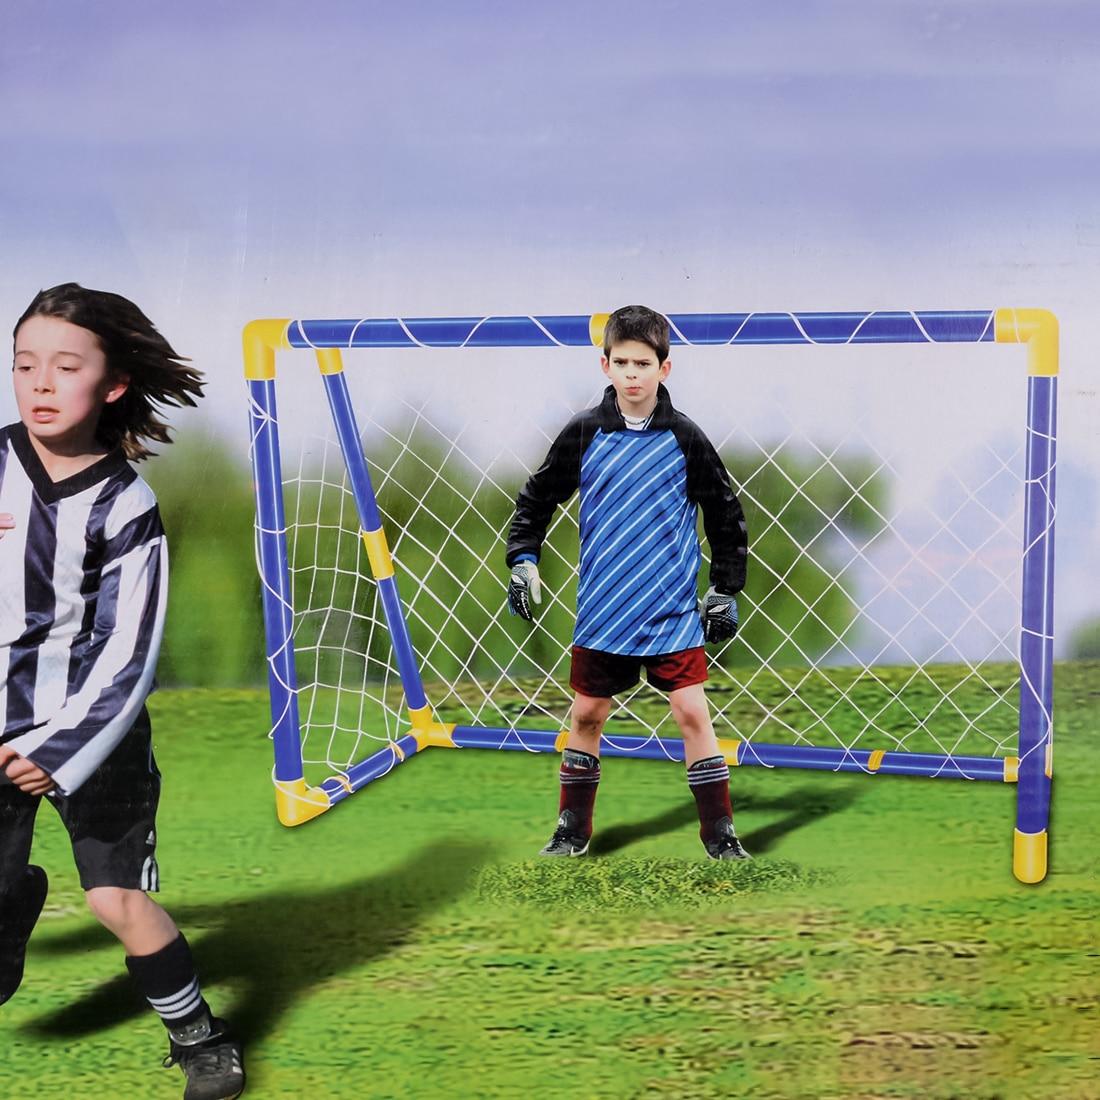 Portable Folding Goal Kids Football Net Football Door Set Football Gate for Children Training недорго, оригинальная цена